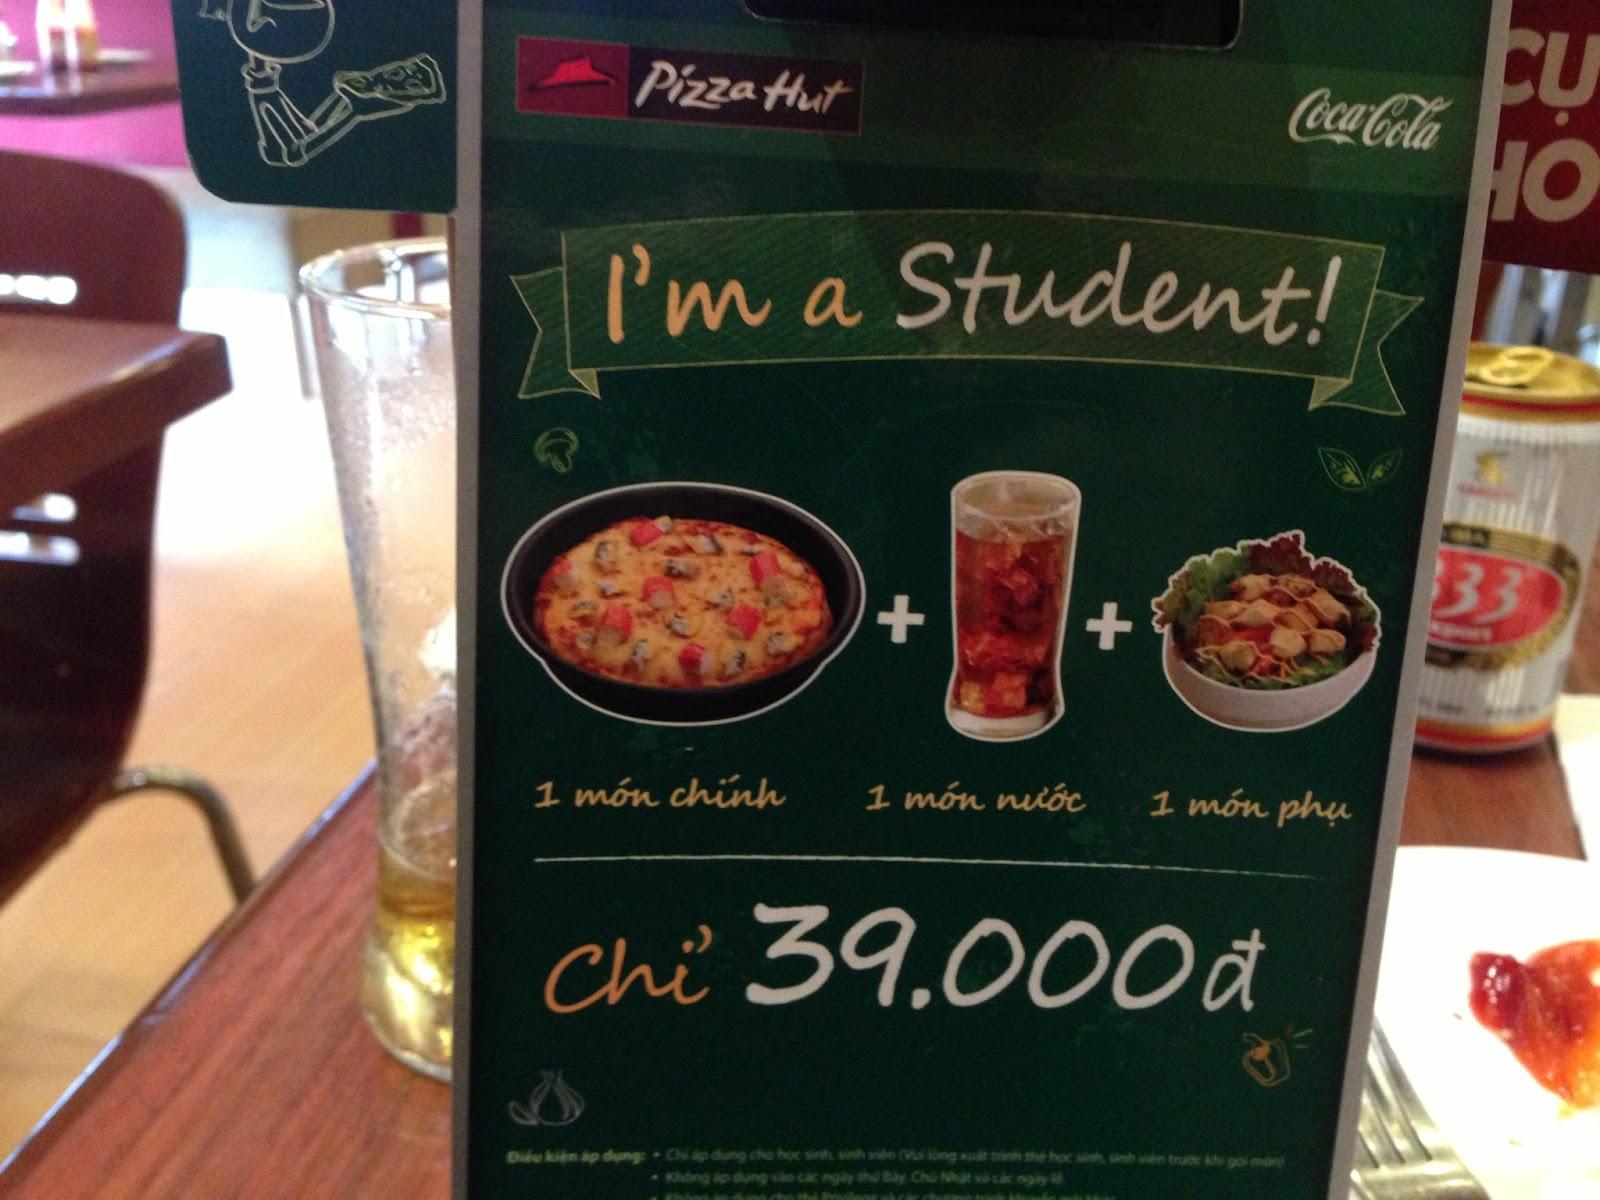 pizza-hut-ad-forstudents